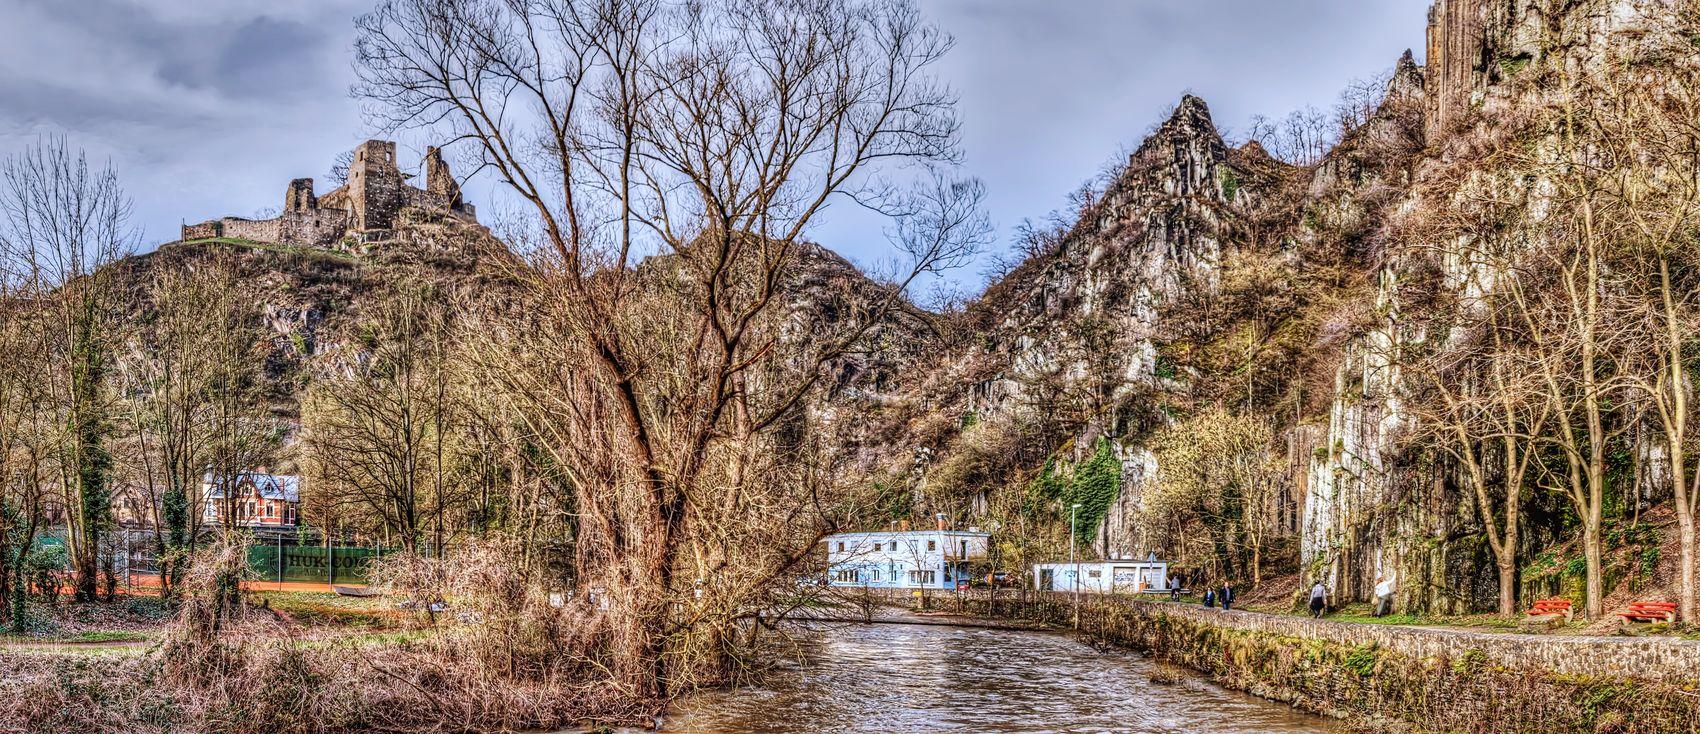 Rotweinwanderweg Wanderweg Ahr Altenahr Burg Are Burg Ruine Ruin Castle Walkway River River Ahr Fluss Felsen Rock Formation